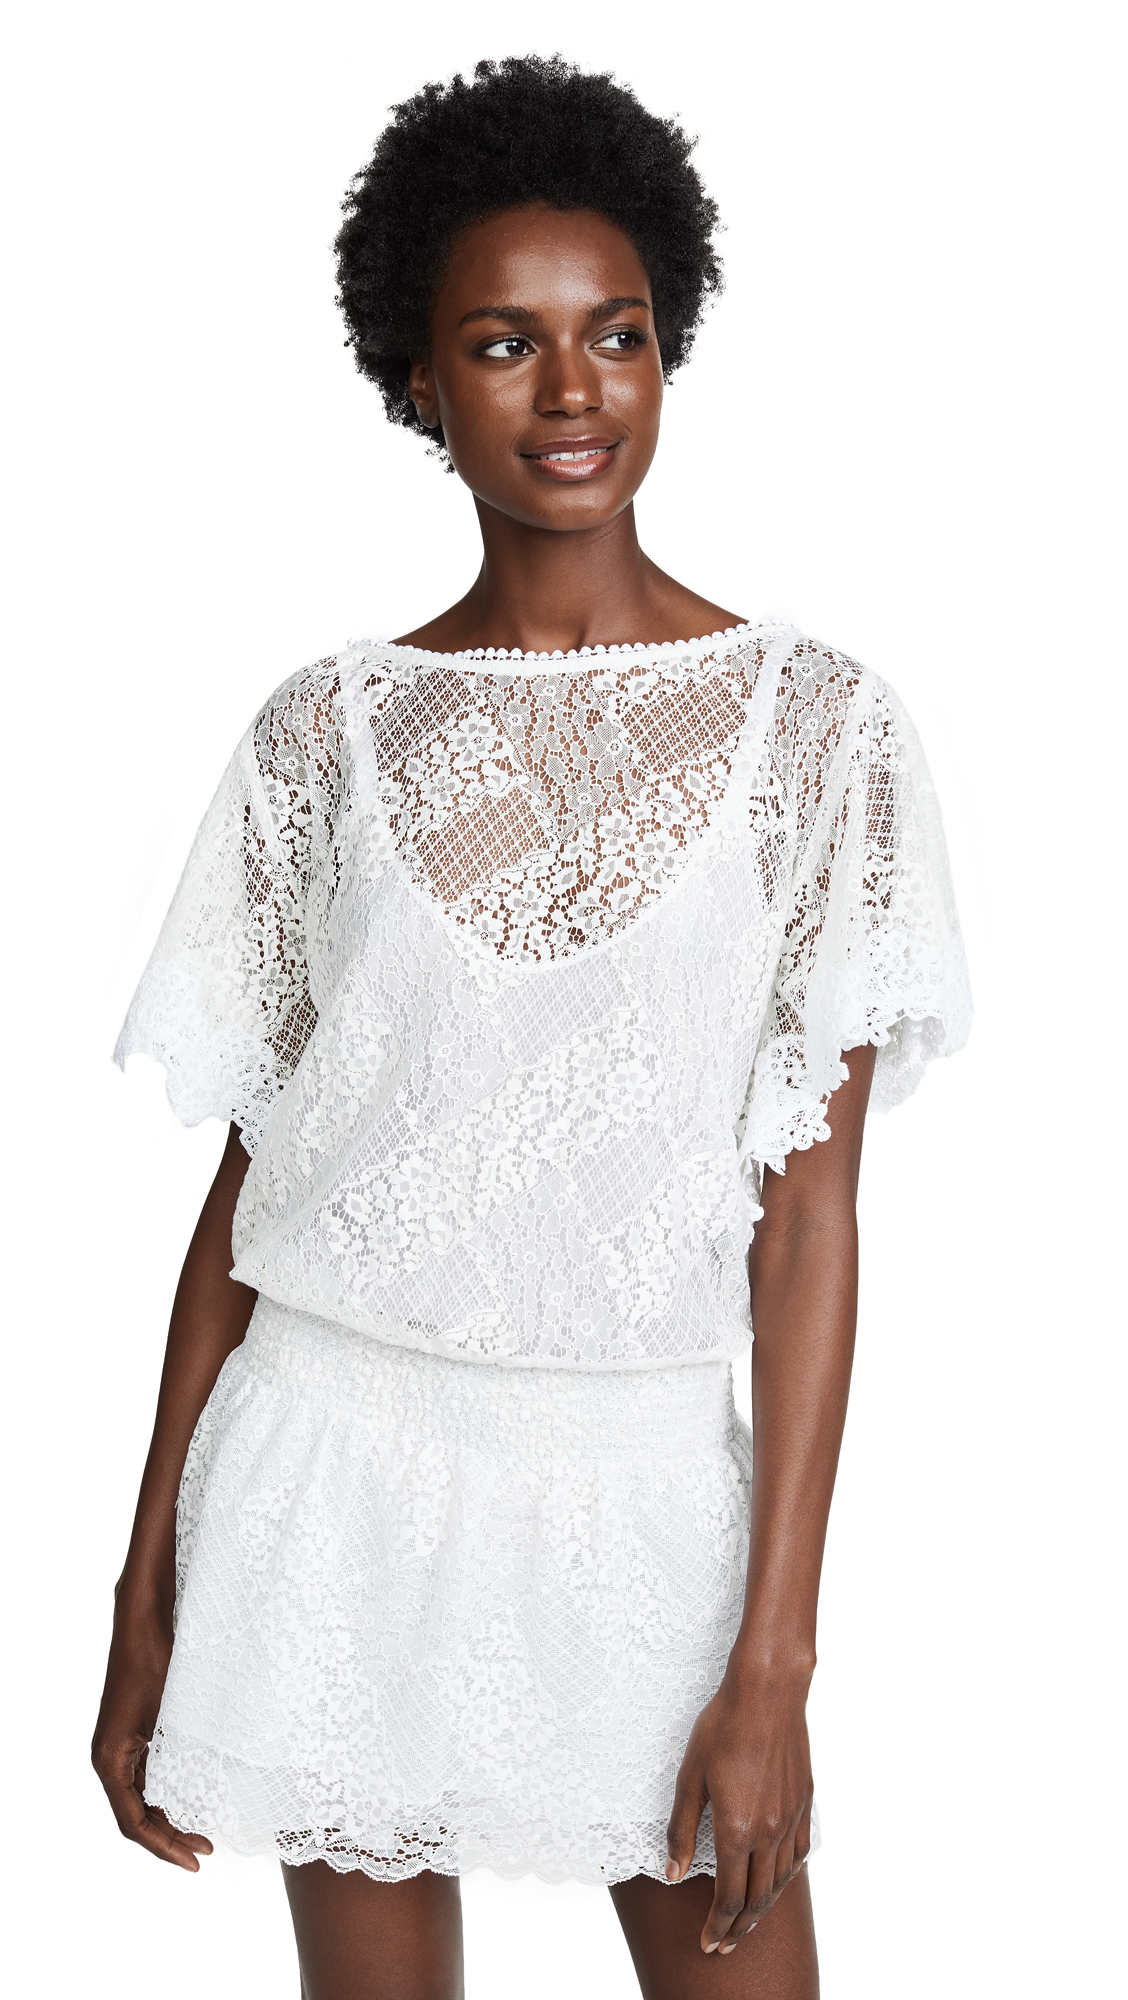 Temptation Positano Bristol Drop Waist Short Sleeve Dress - White